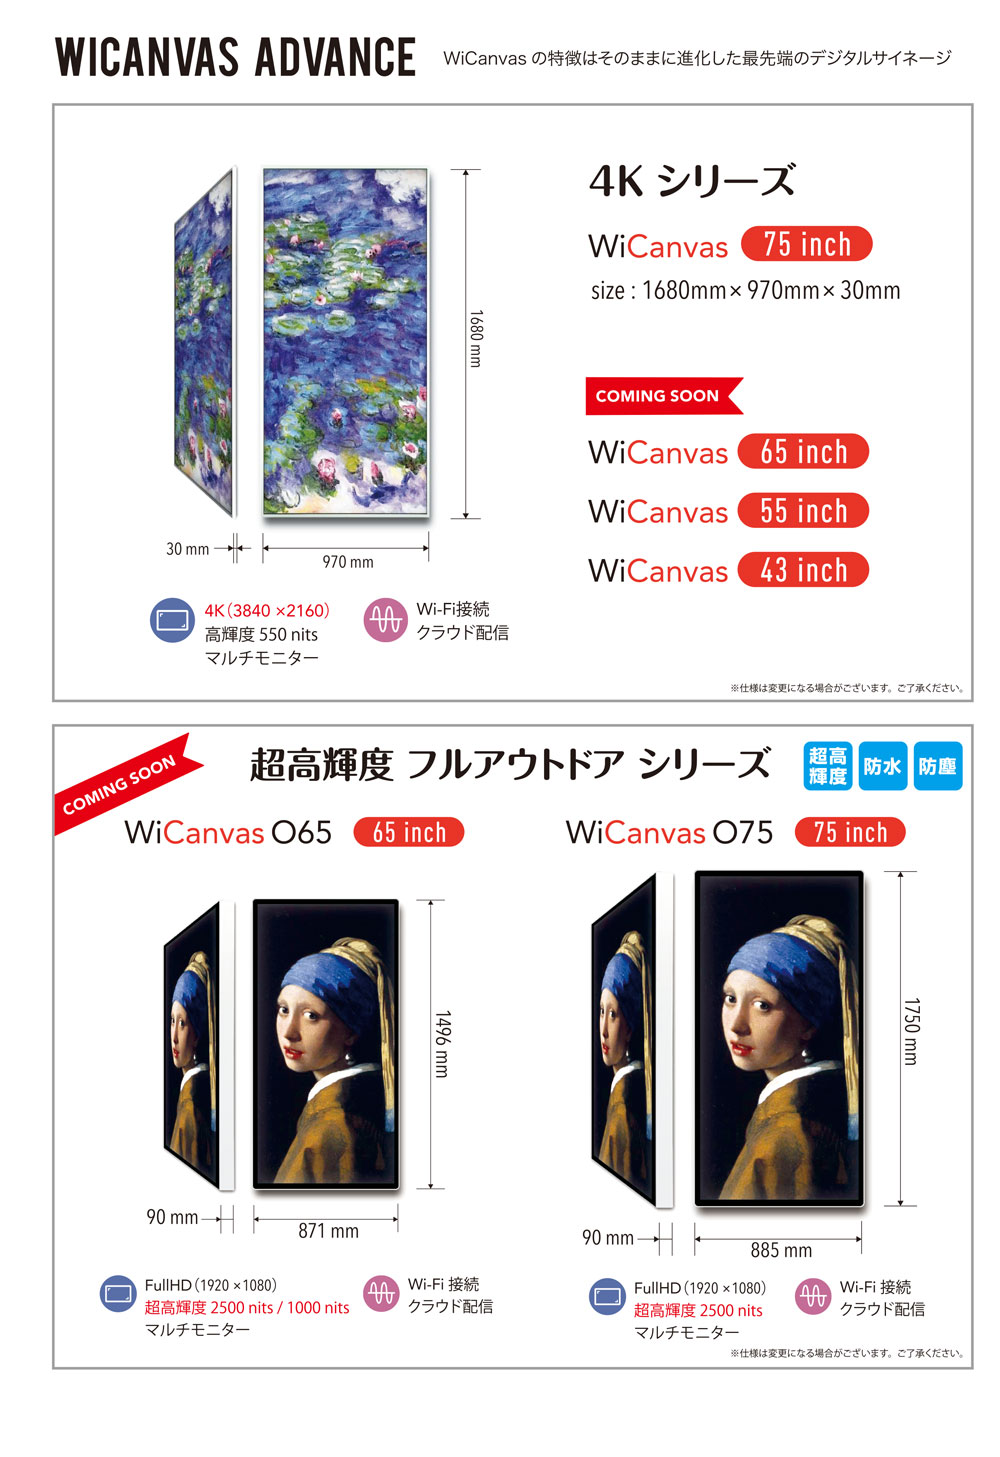 WiCanvas 4K,防水・防塵,超薄型デジタルサイネージ,